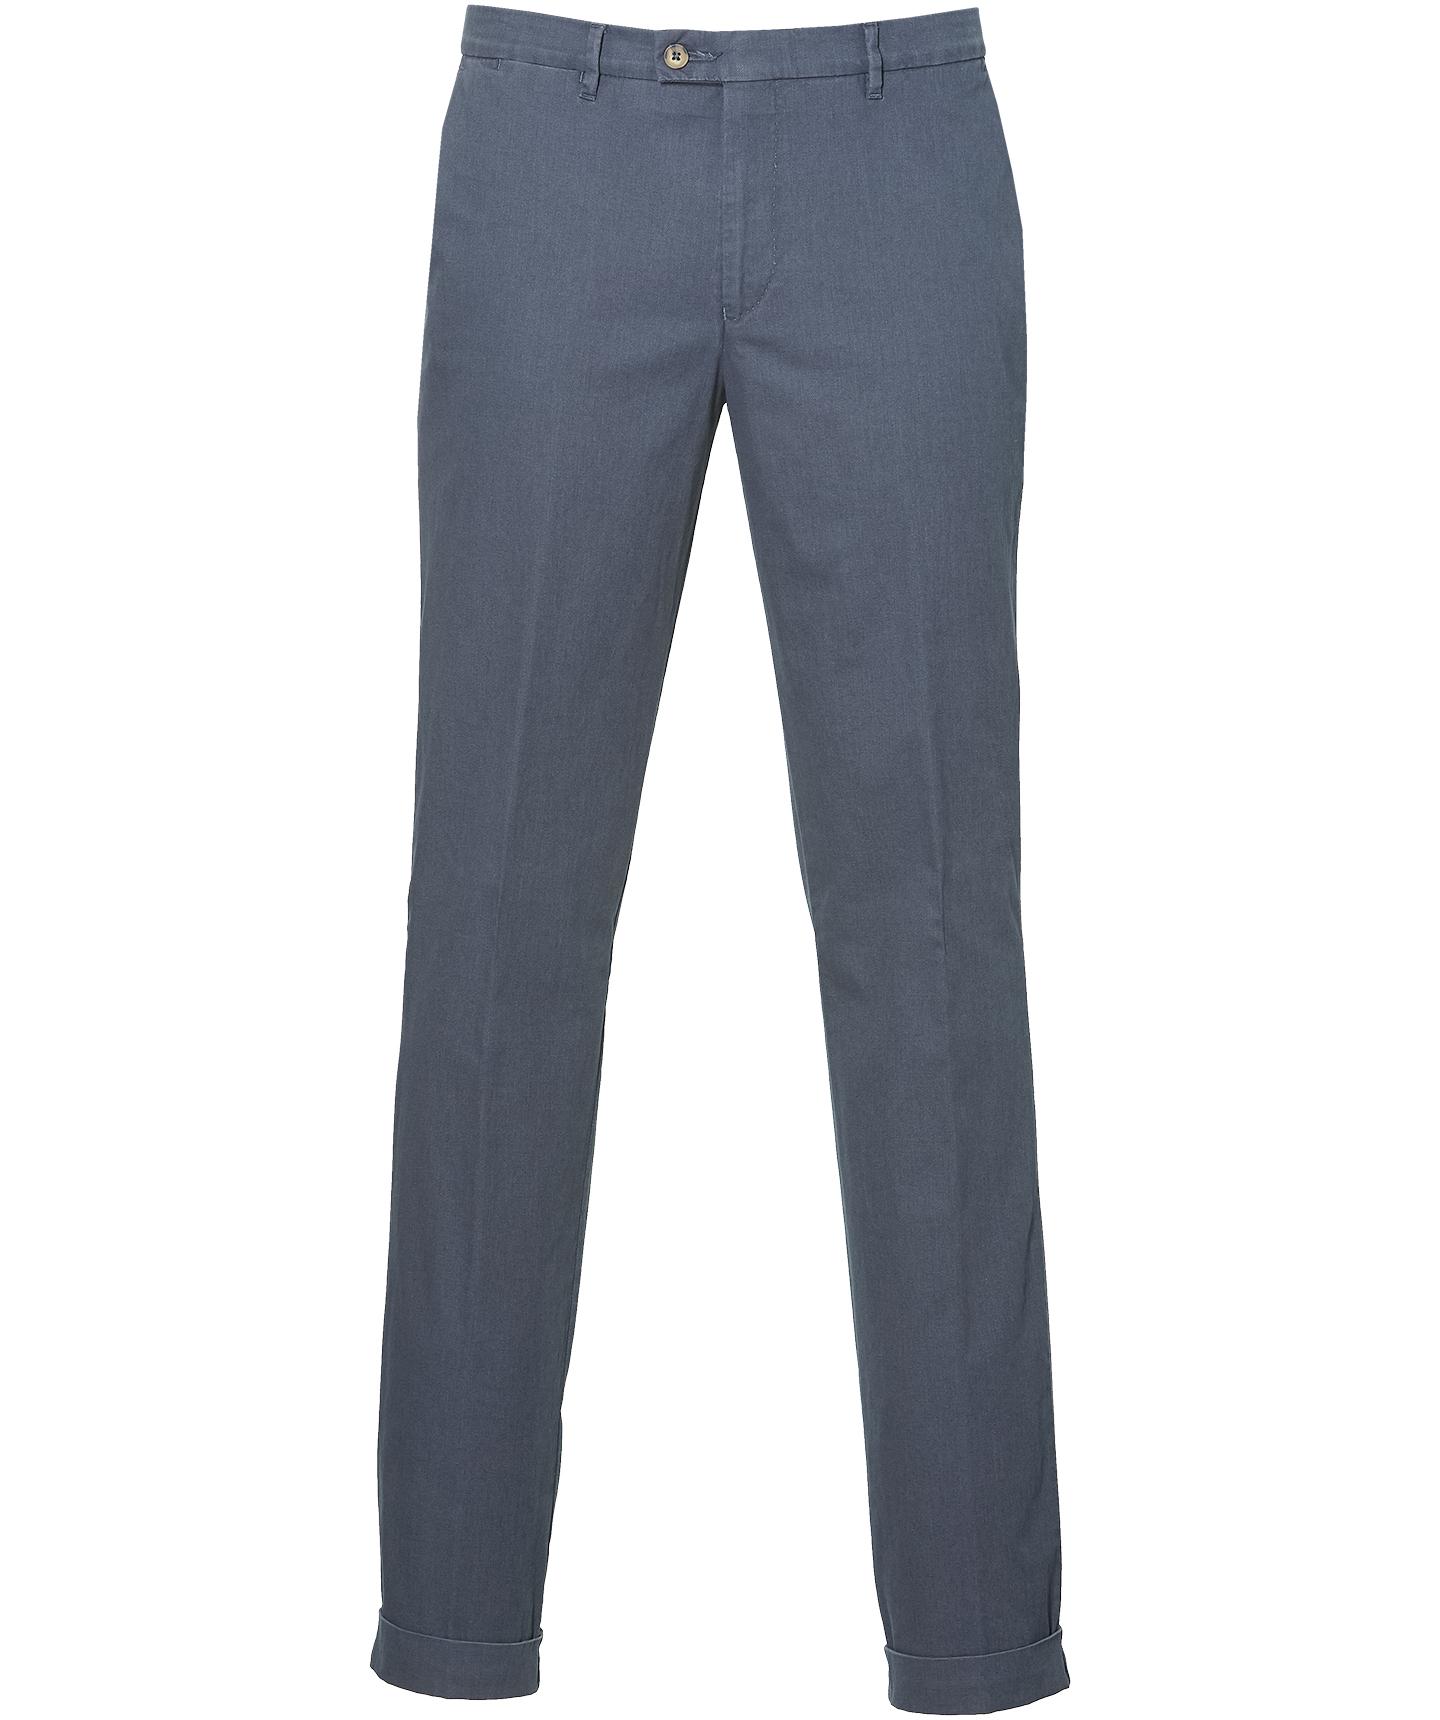 Sale - Hensen Pantalon - Slim Fit - Blauw